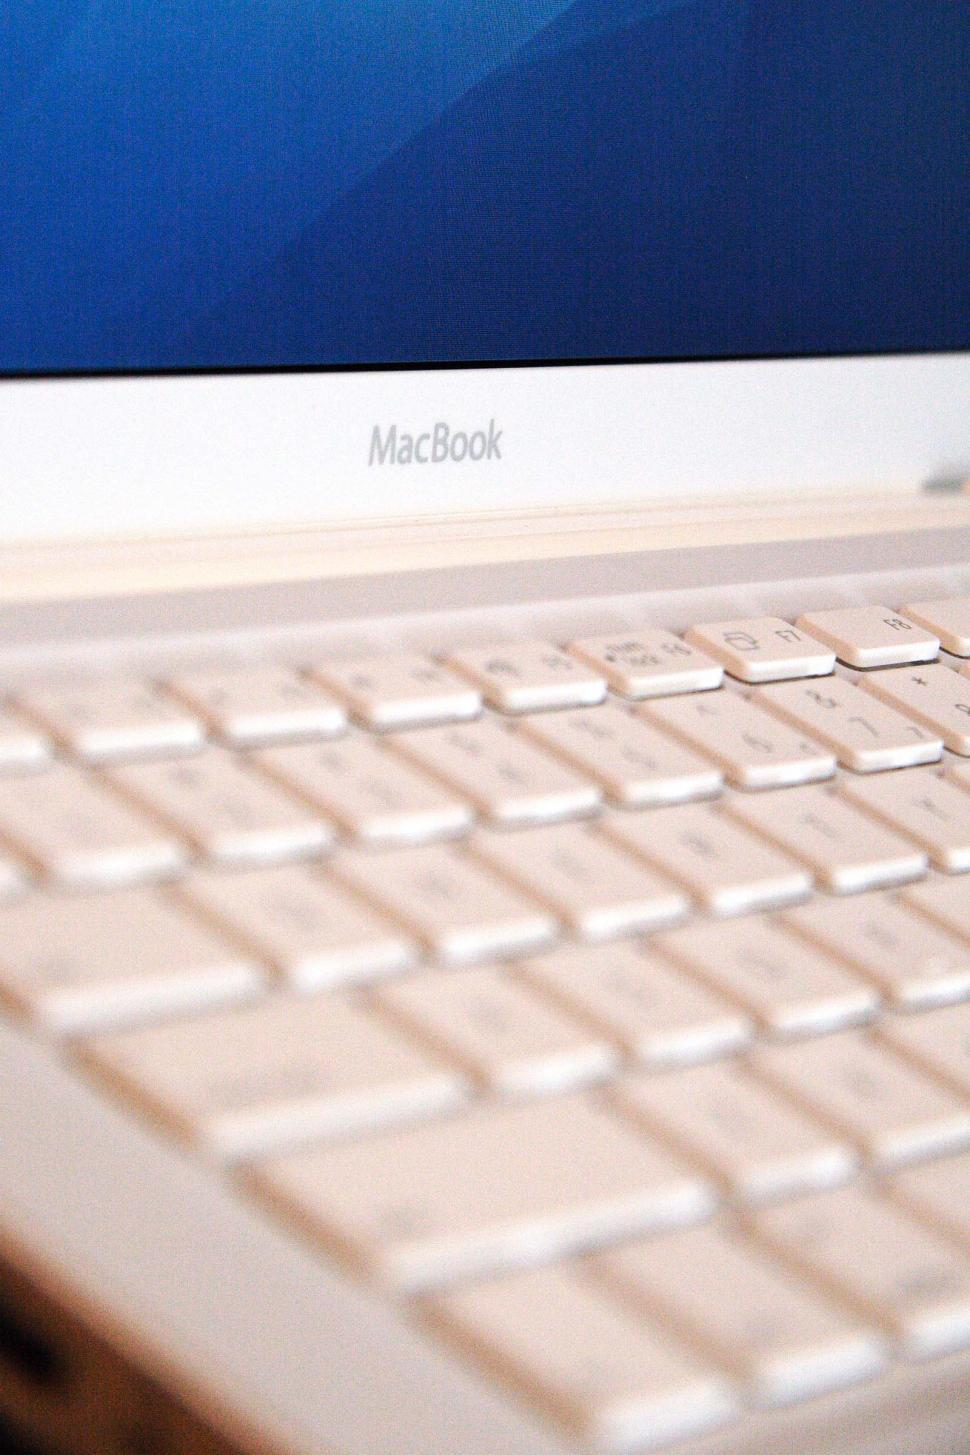 Download Free Stock Photo of apple macbook laptop computer keyboard technology macintosh